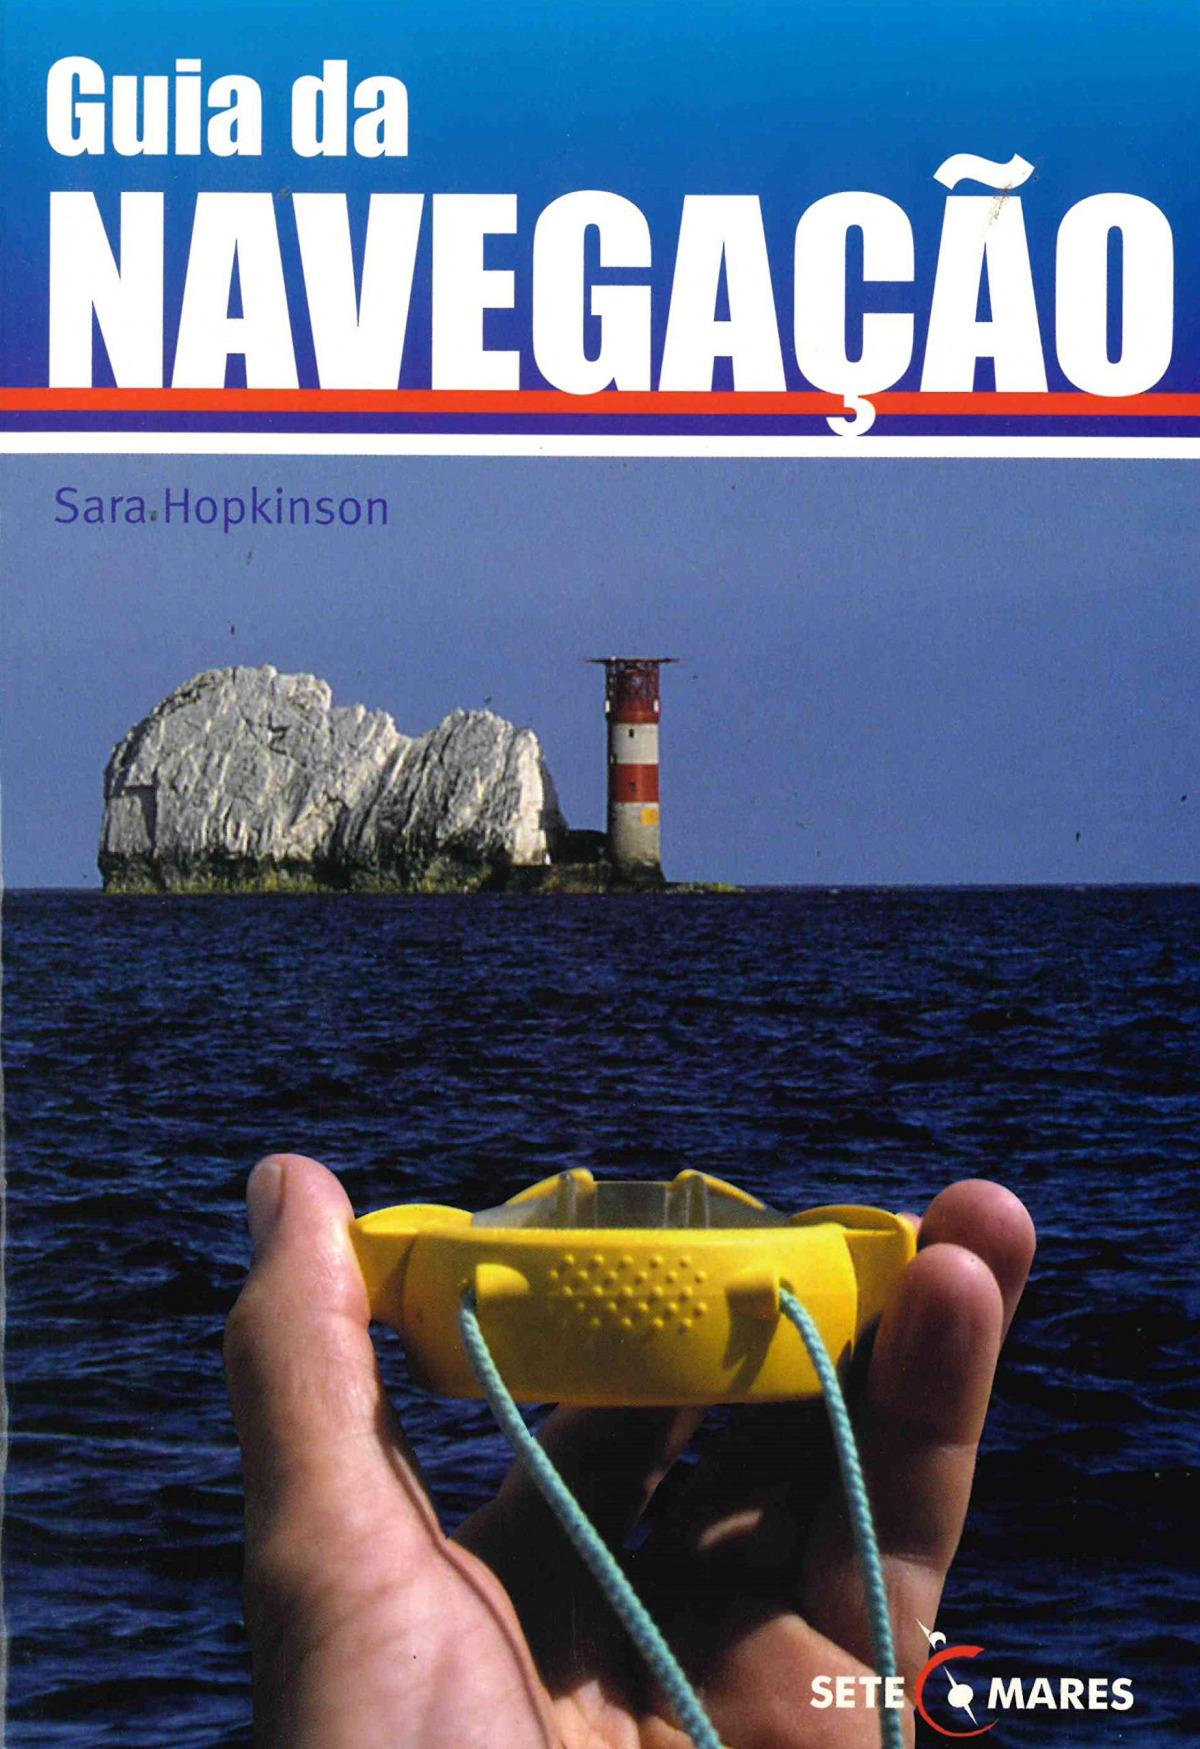 Guia da Navegaçao 9789729951640